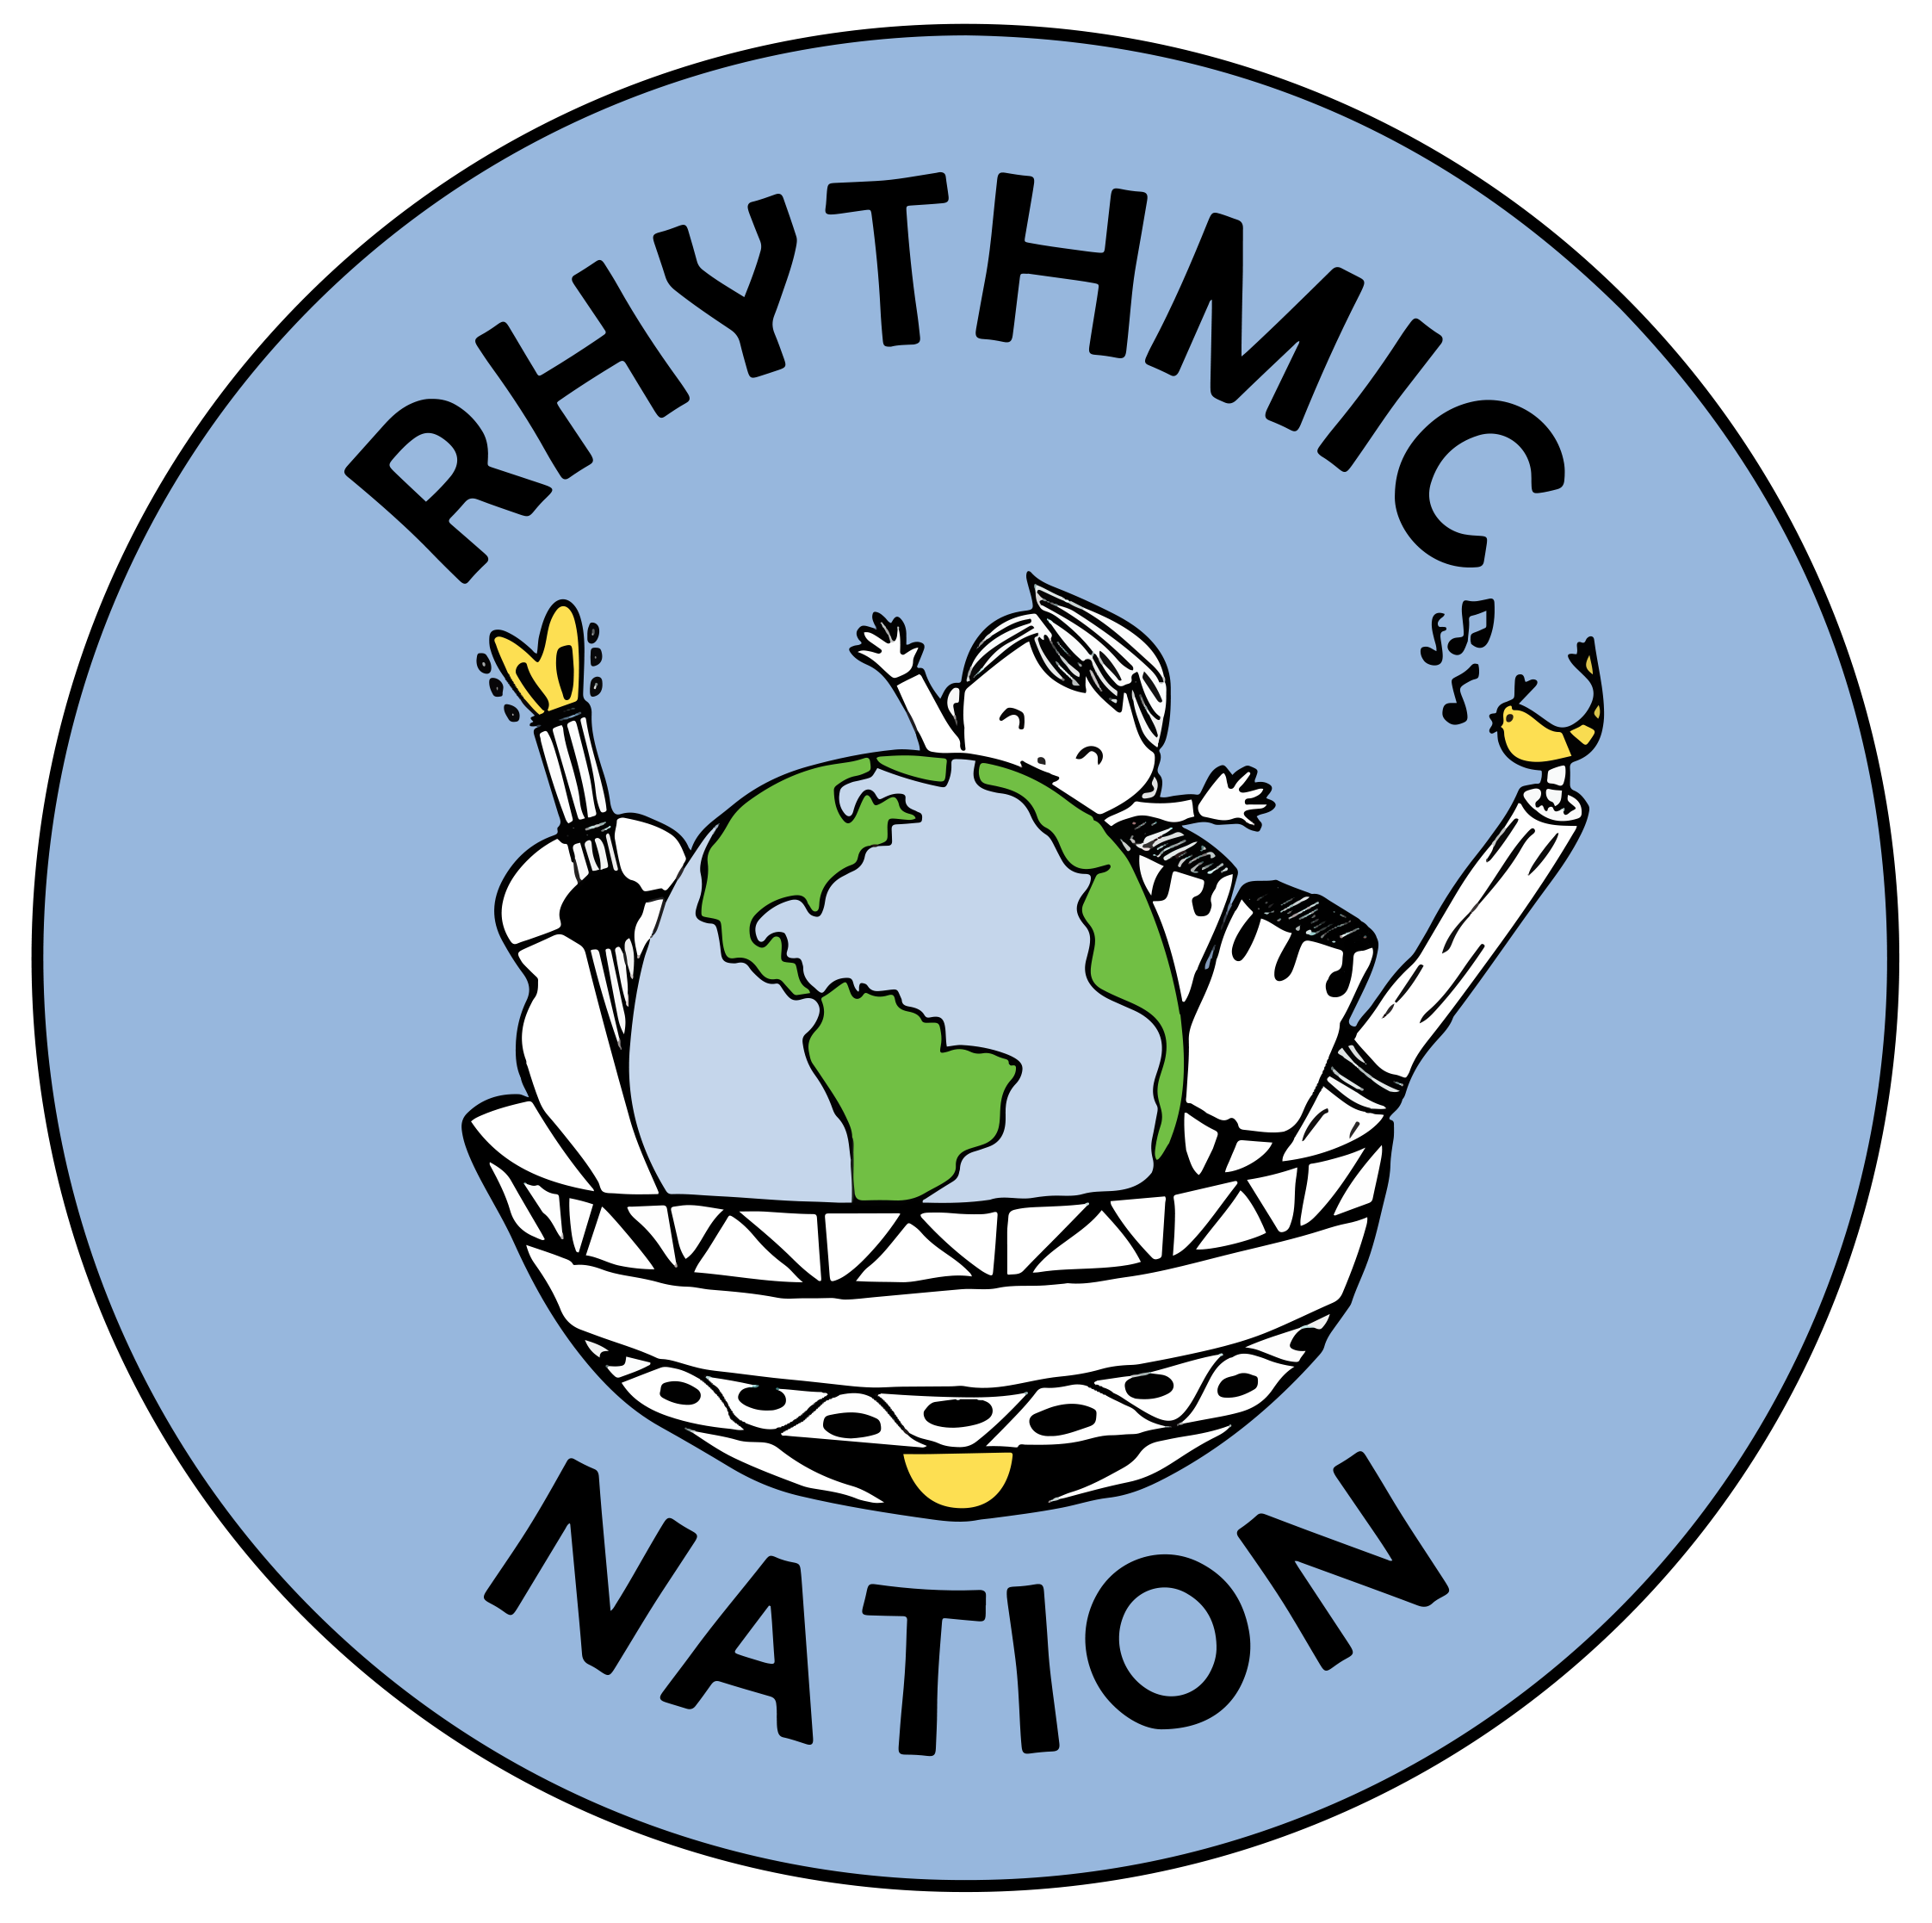 rythmic logo 2.png